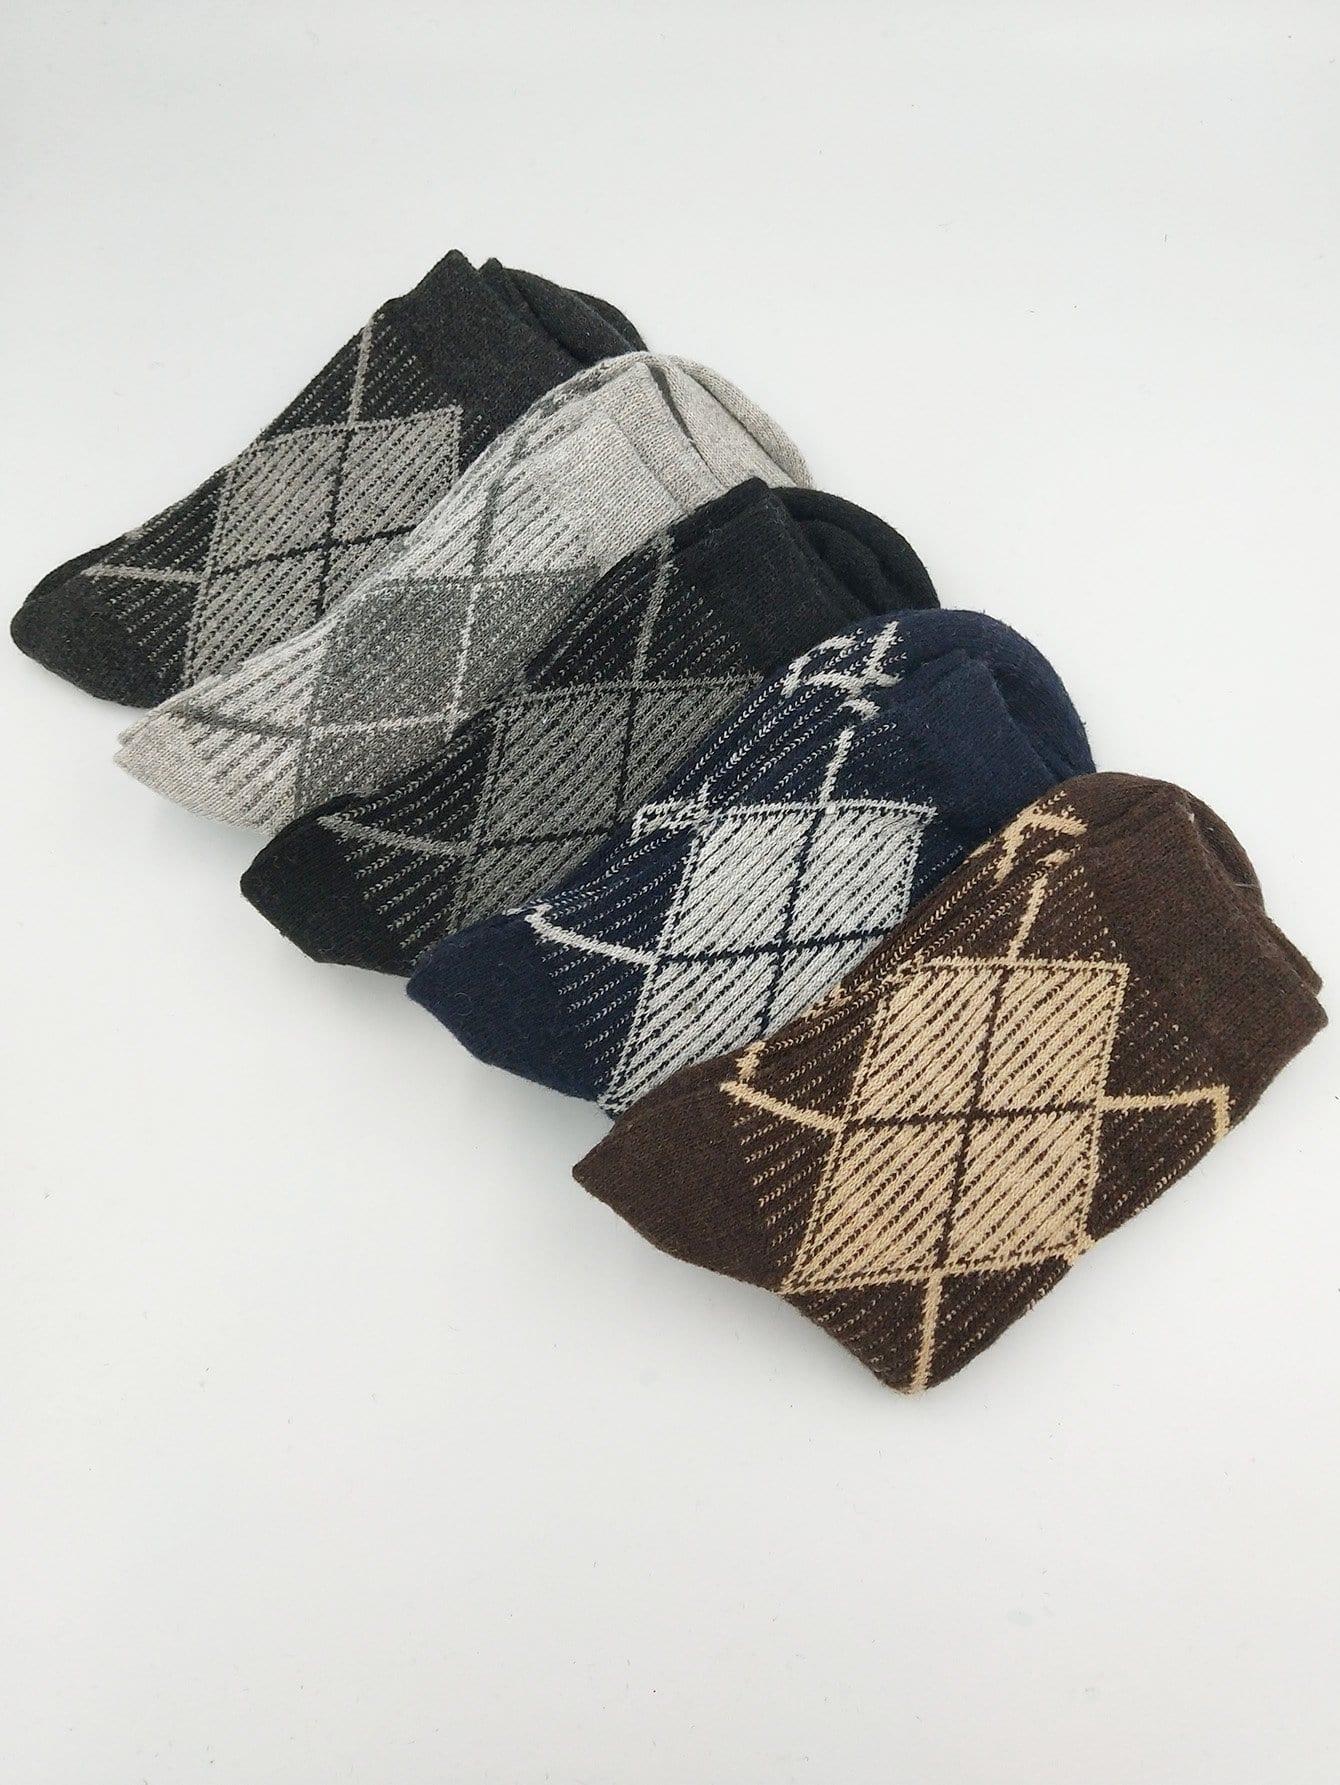 Männer Socken 5Paare mit Diamond Muster